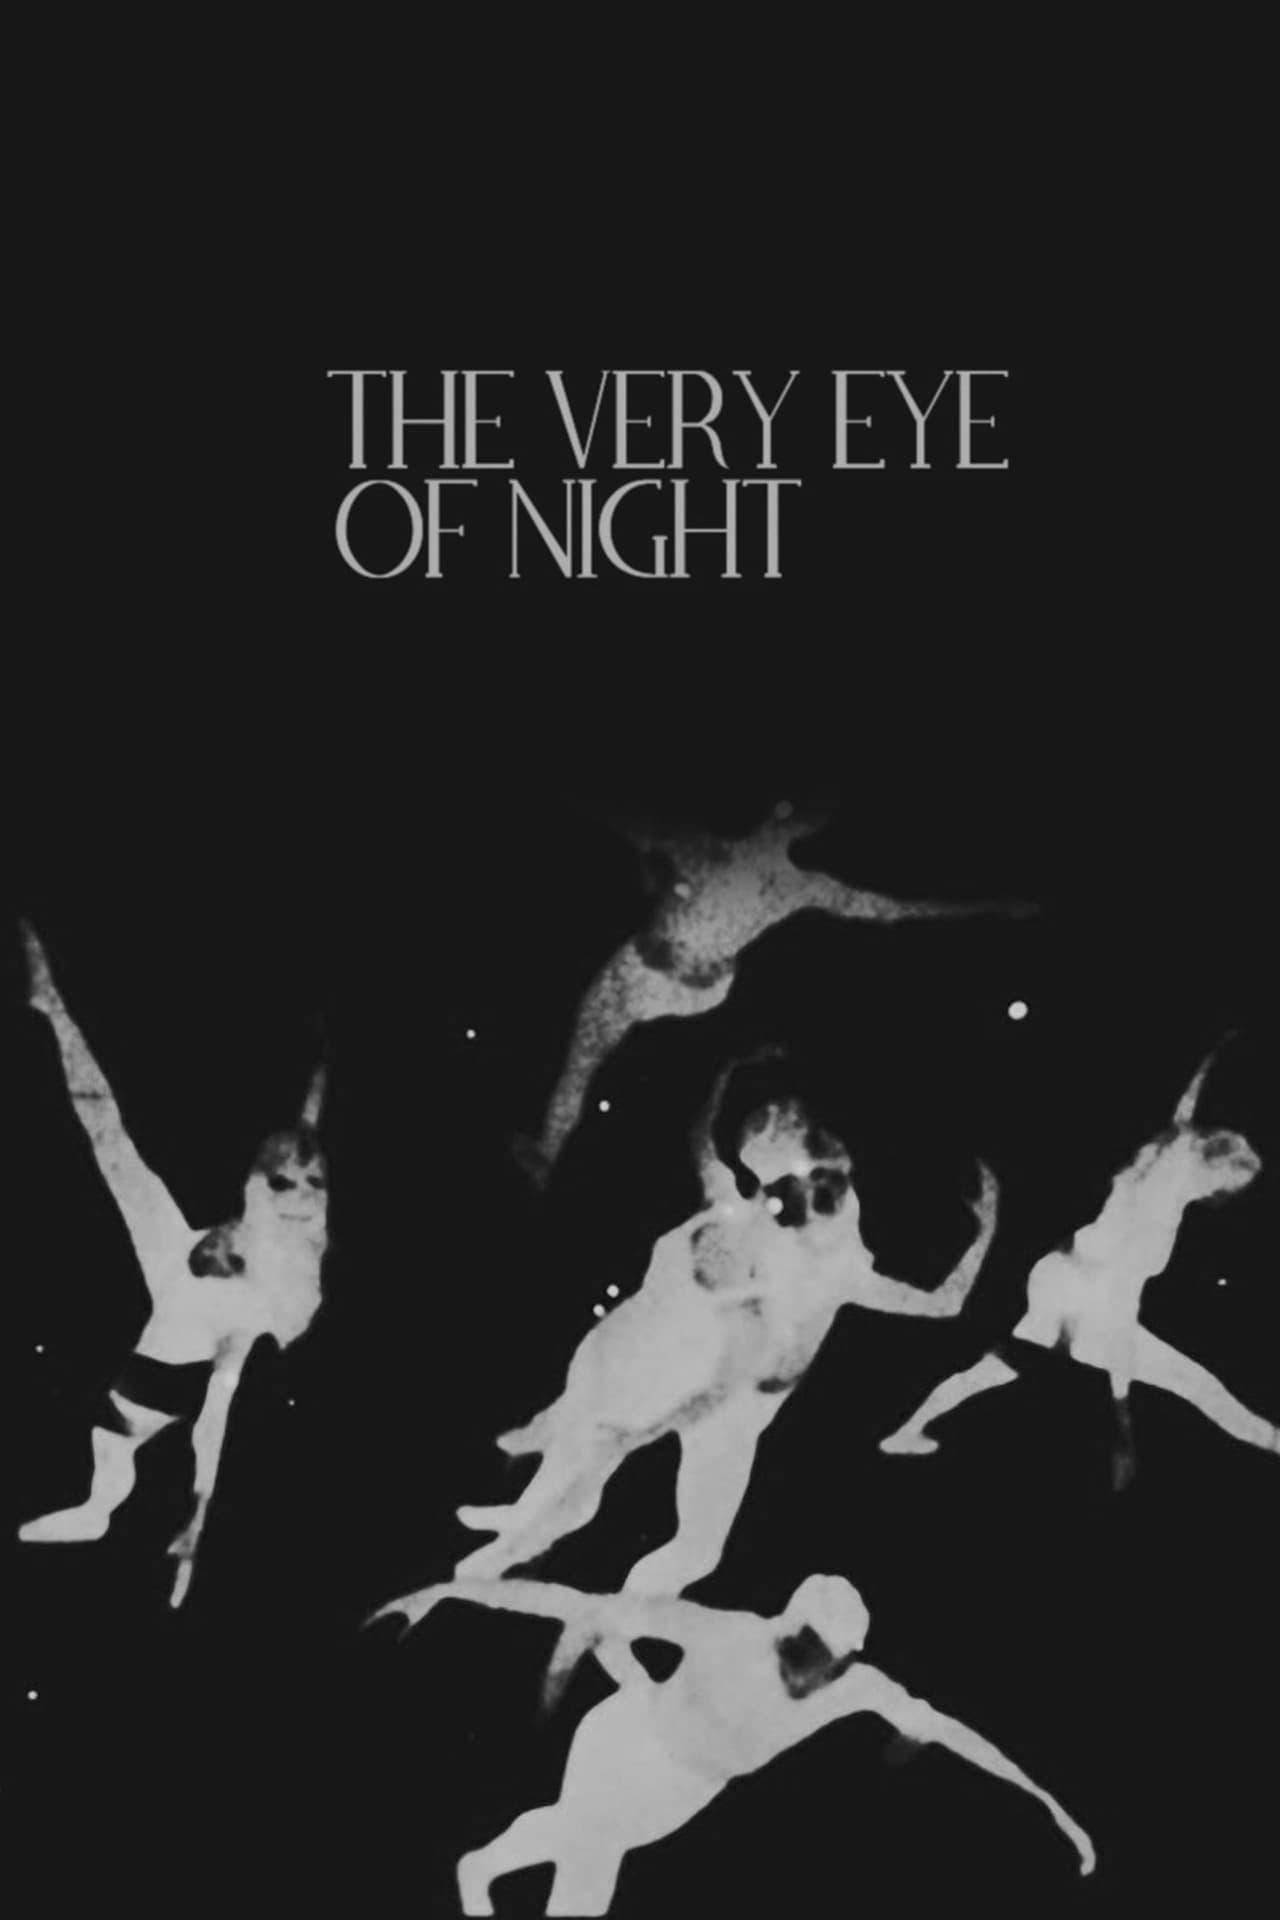 The Very Eye of Night